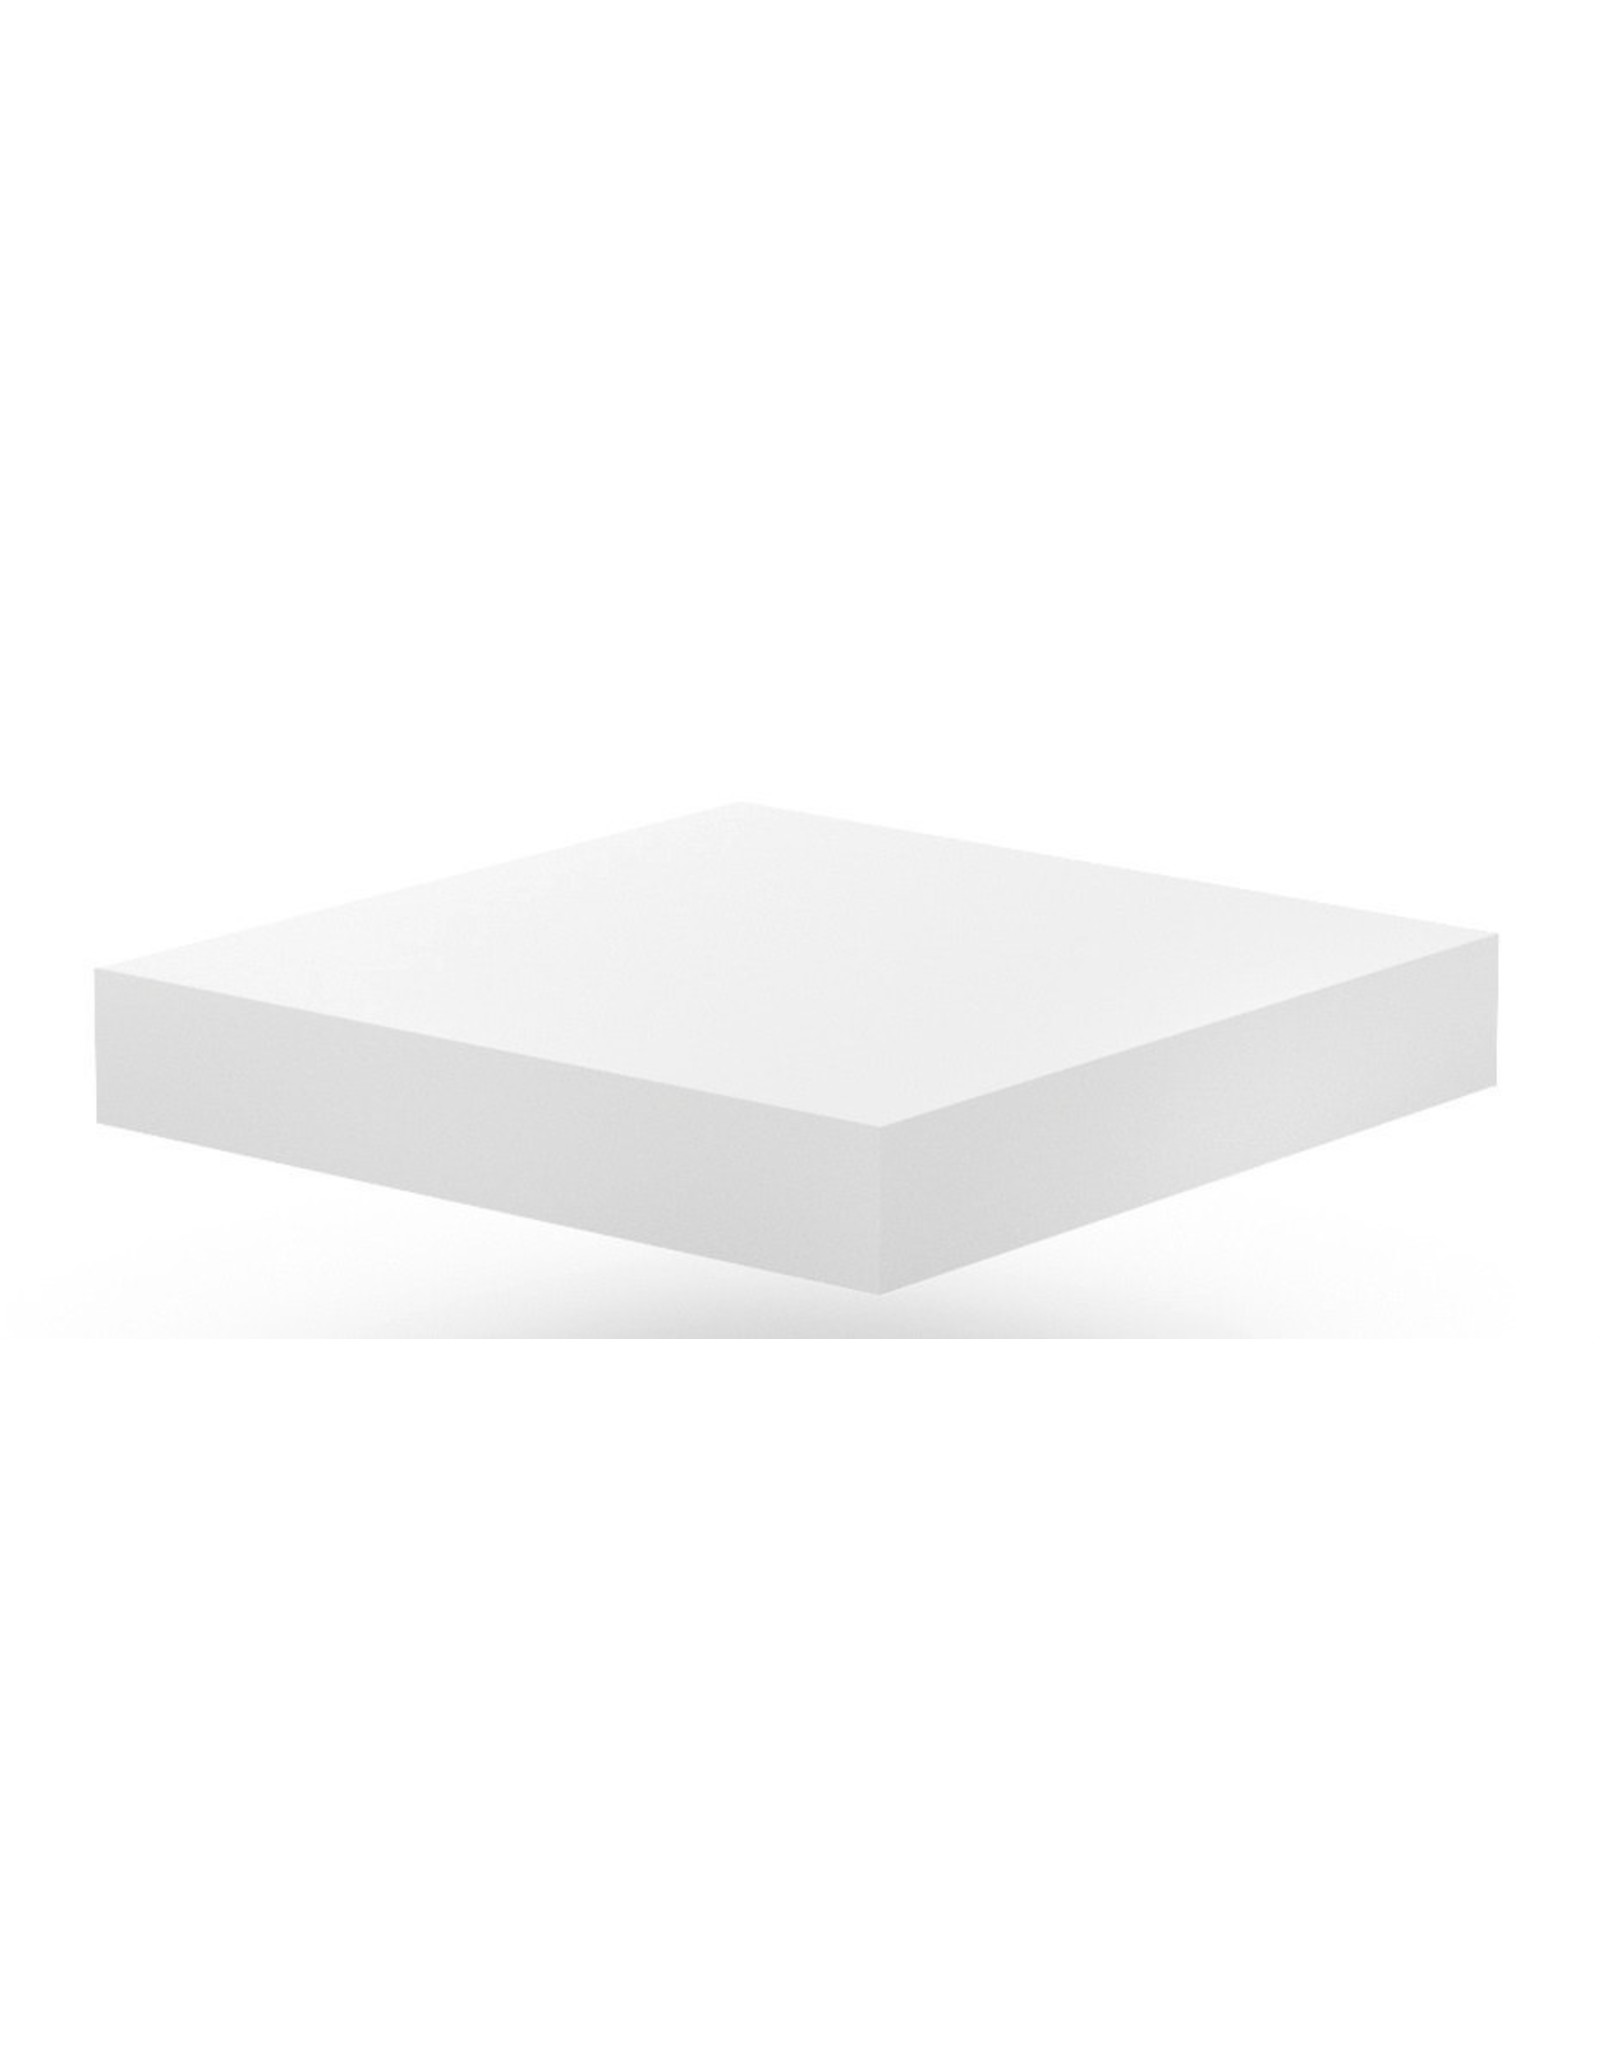 Hakblok onderstel | inclusief kunststof hakblok | 400-500mm breed | 400 of 500mm diep